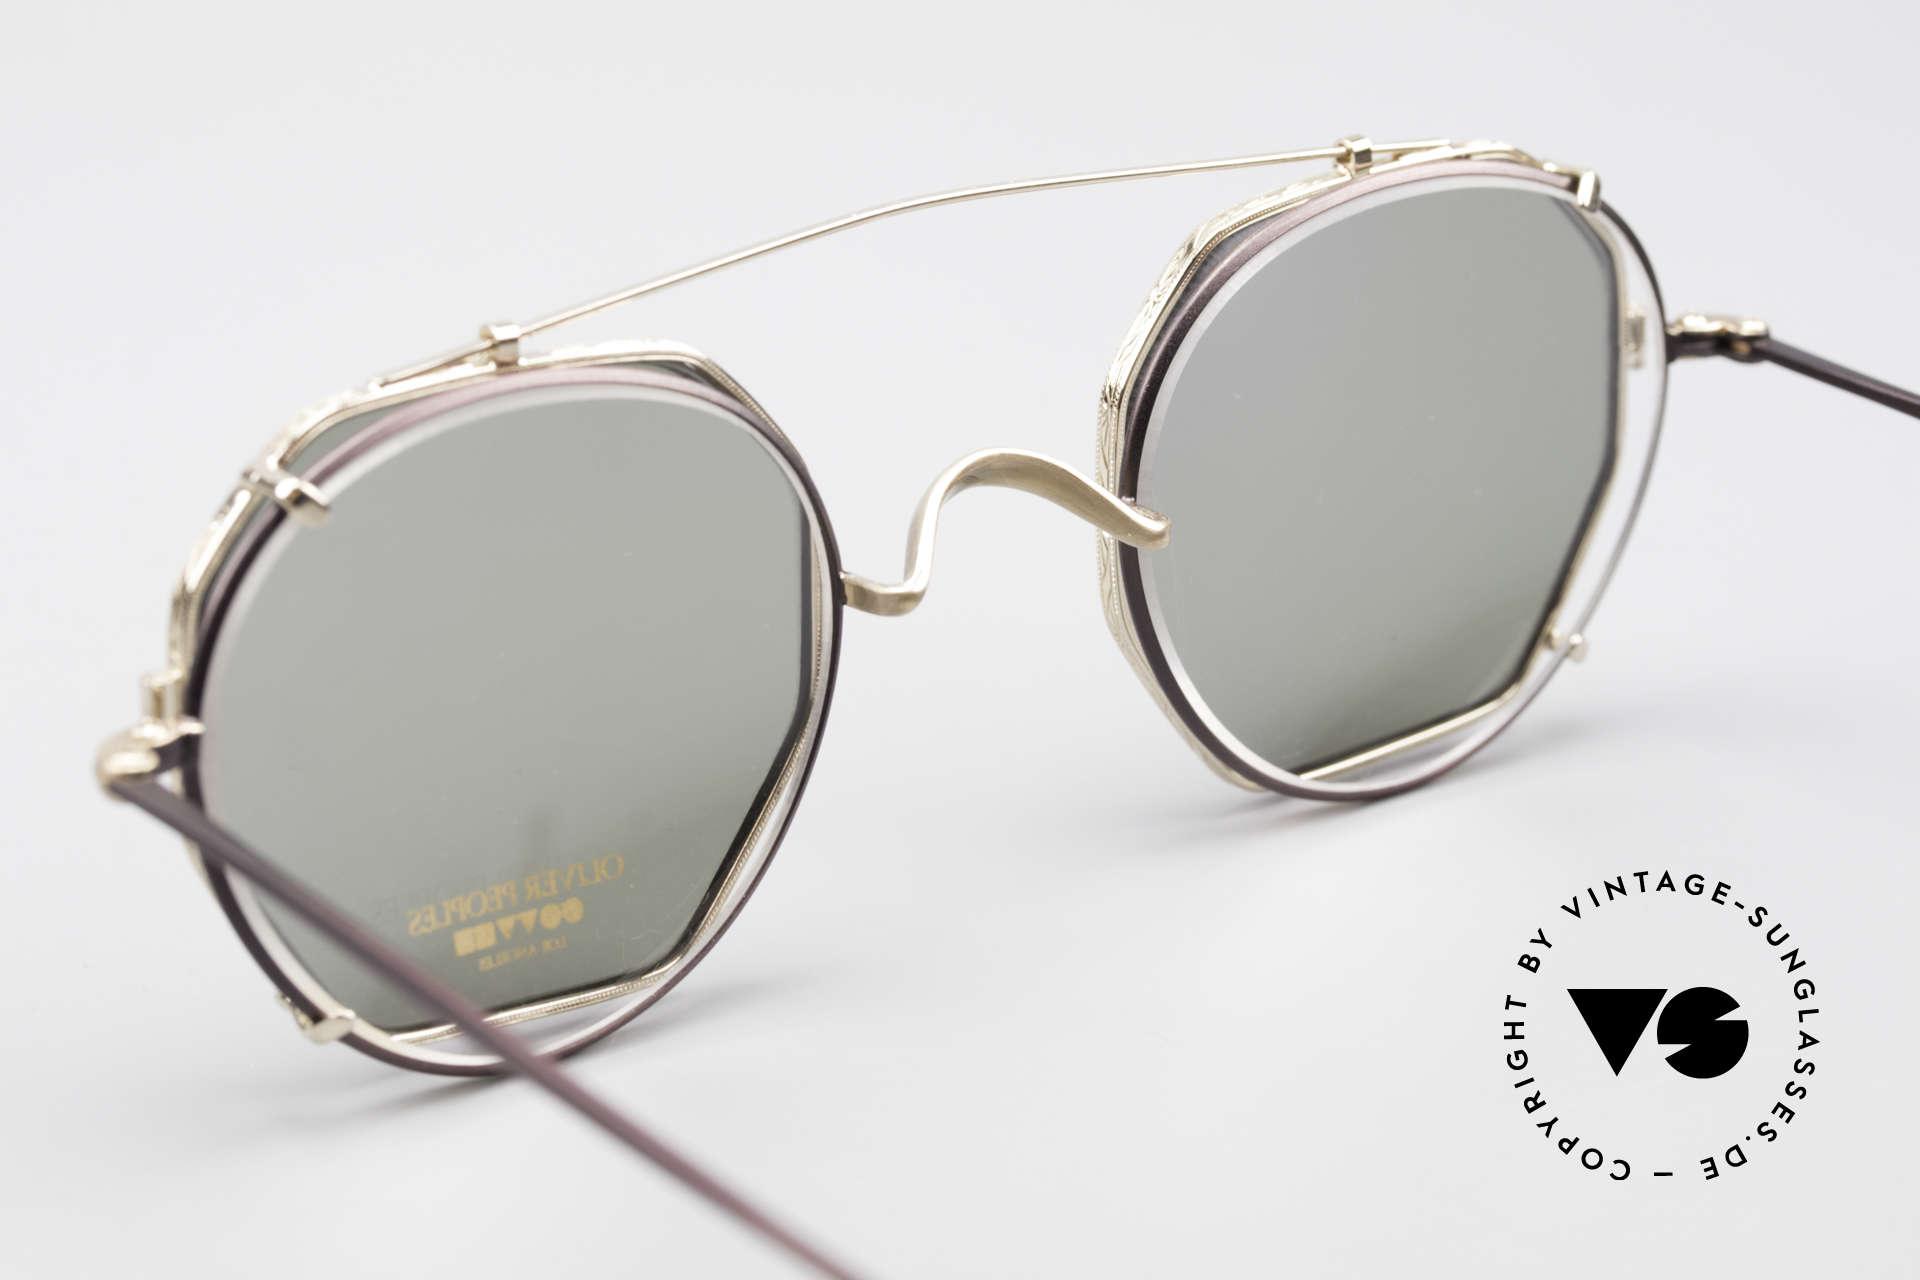 Oliver Peoples OP80BG 90's Vintage Frame Clip On, unworn, NOS (like all our rare Oliver Peoples eyewear), Made for Men and Women